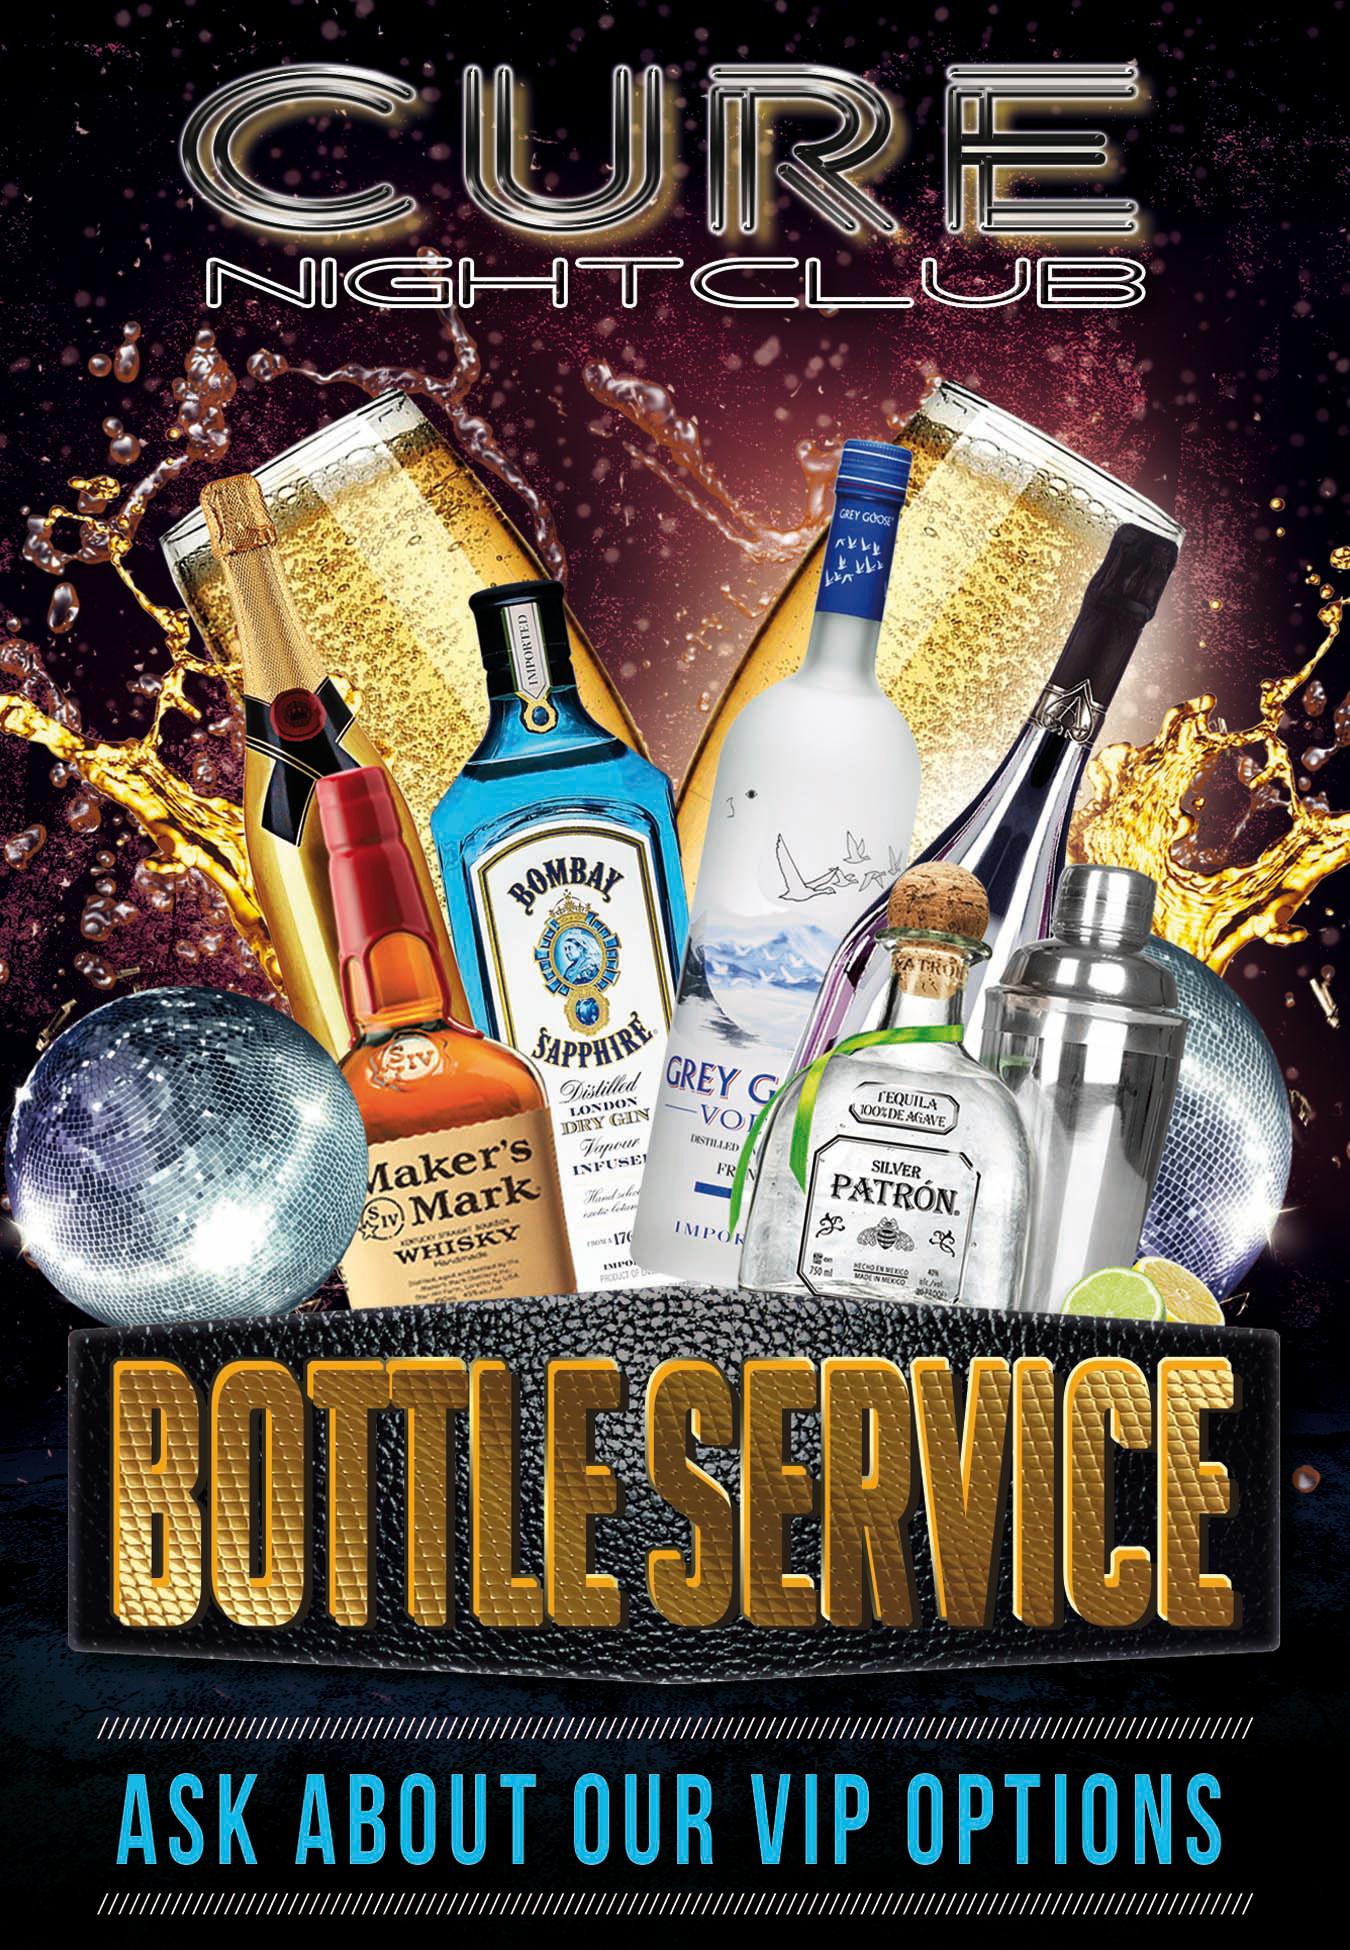 Bottle Service 2